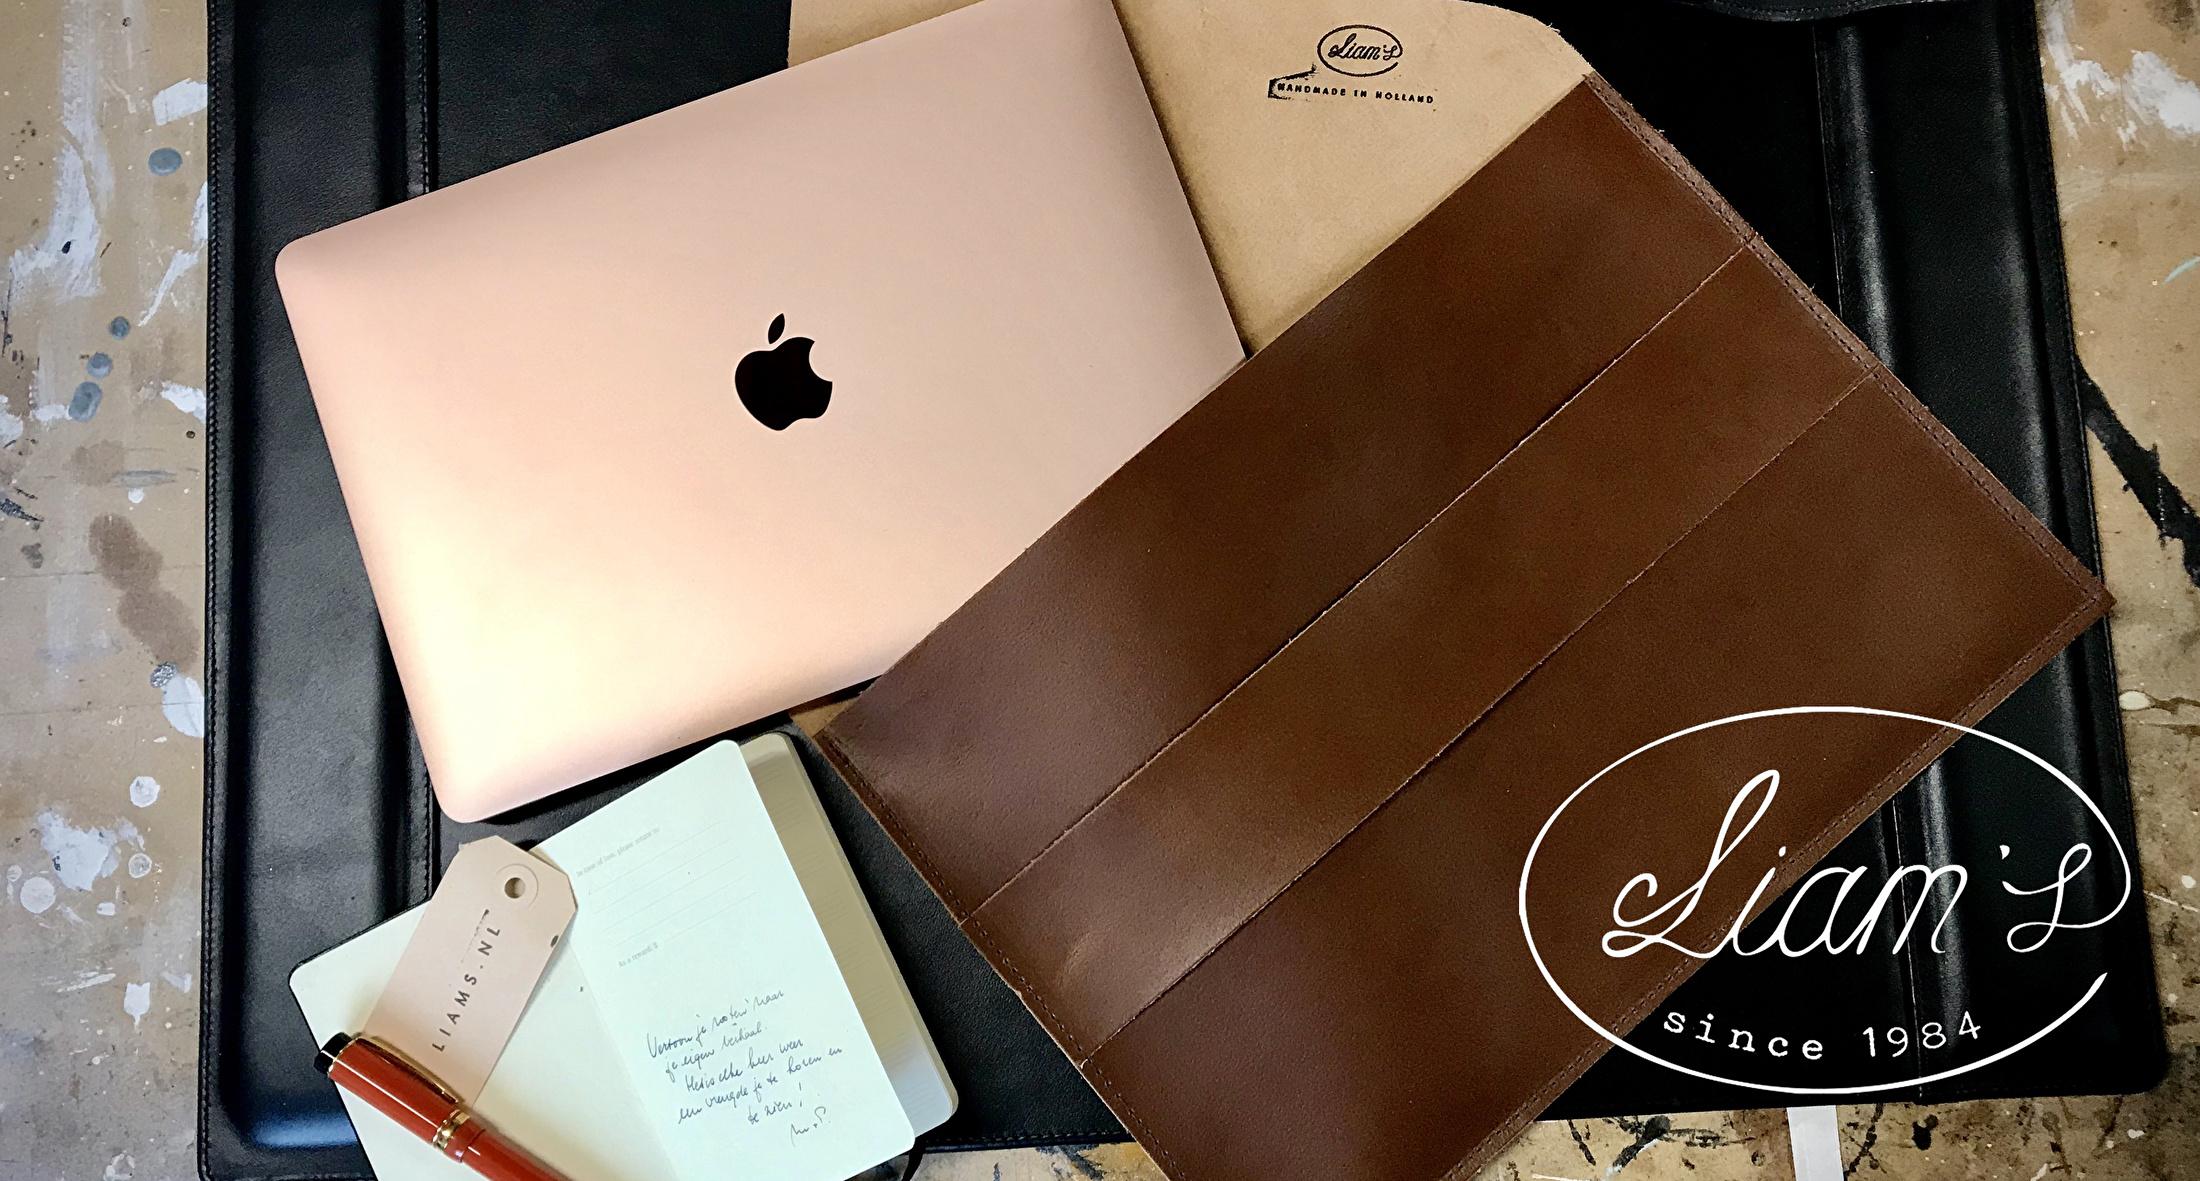 handgemaakte lederwaren kerstkado kerstcadeau gift MacBook Air apple laptop